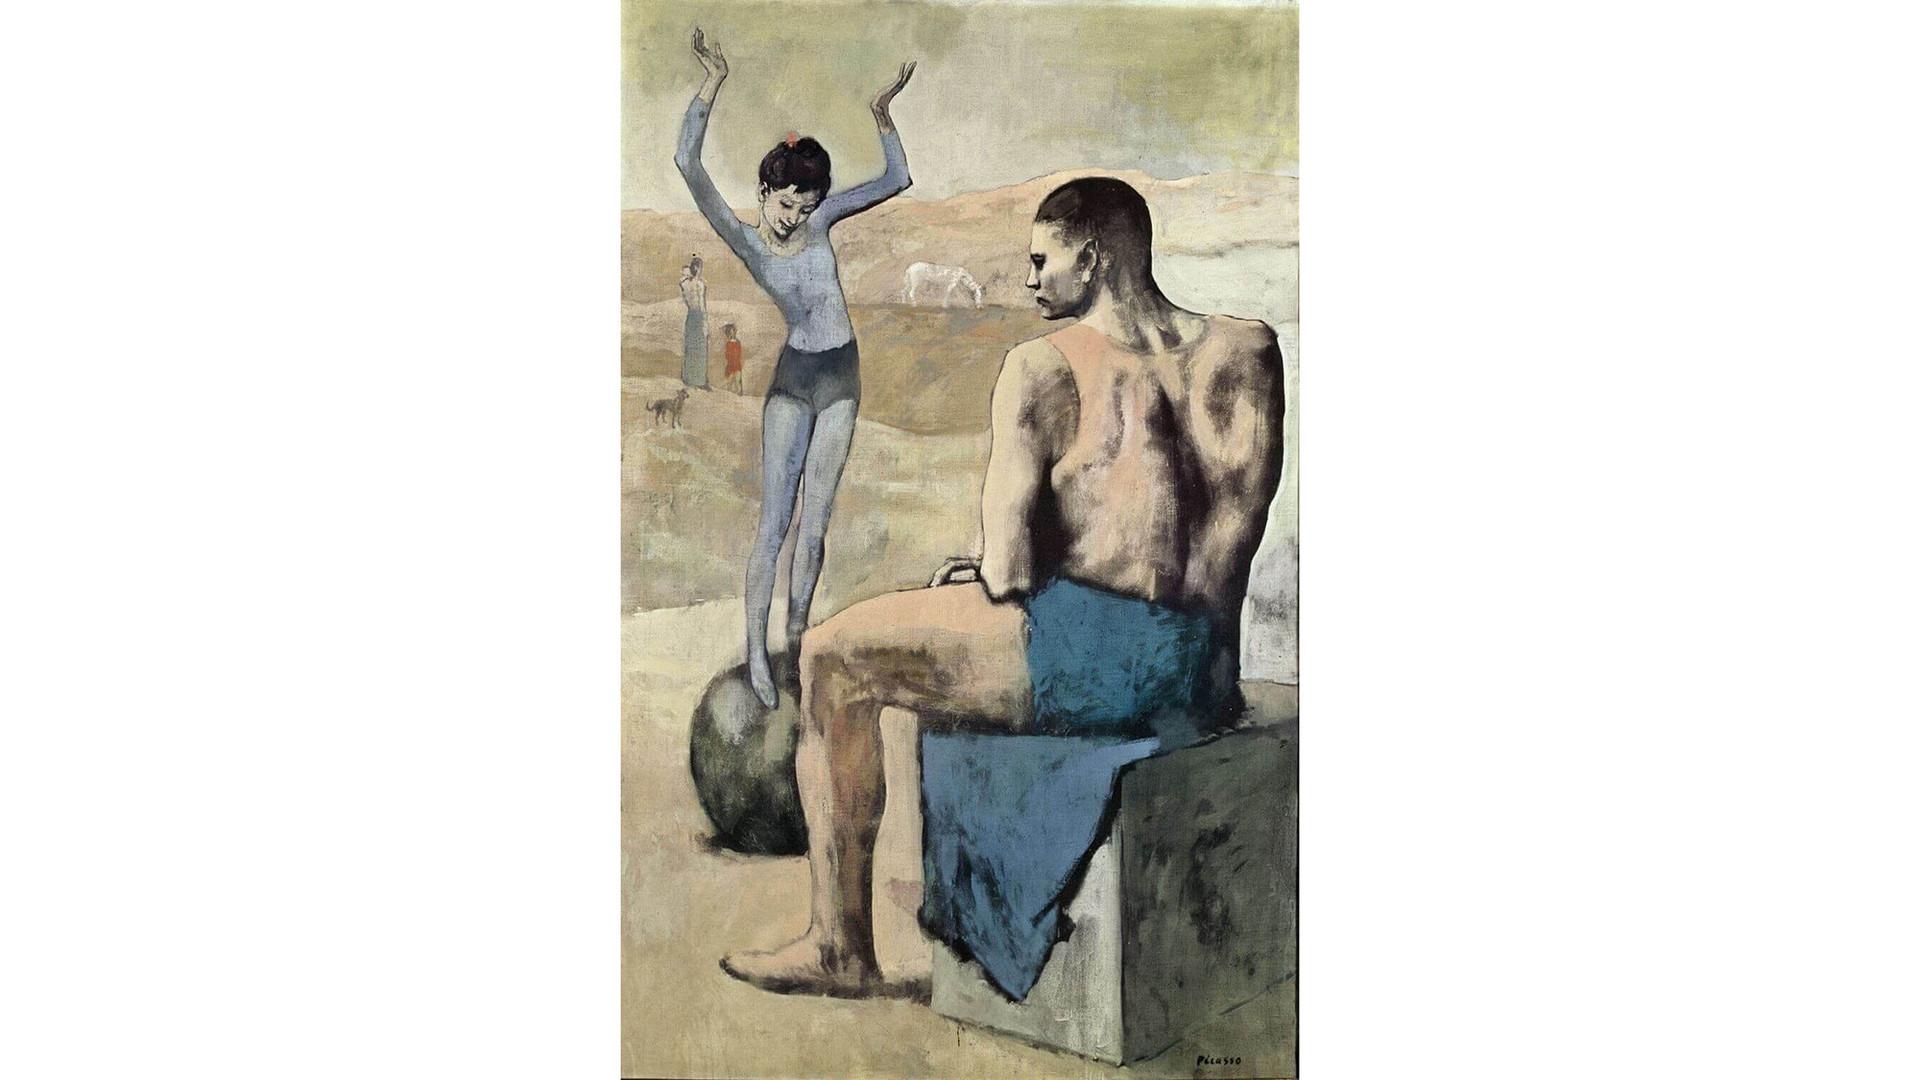 'La acróbata de la bola', de Pablo Picasso.